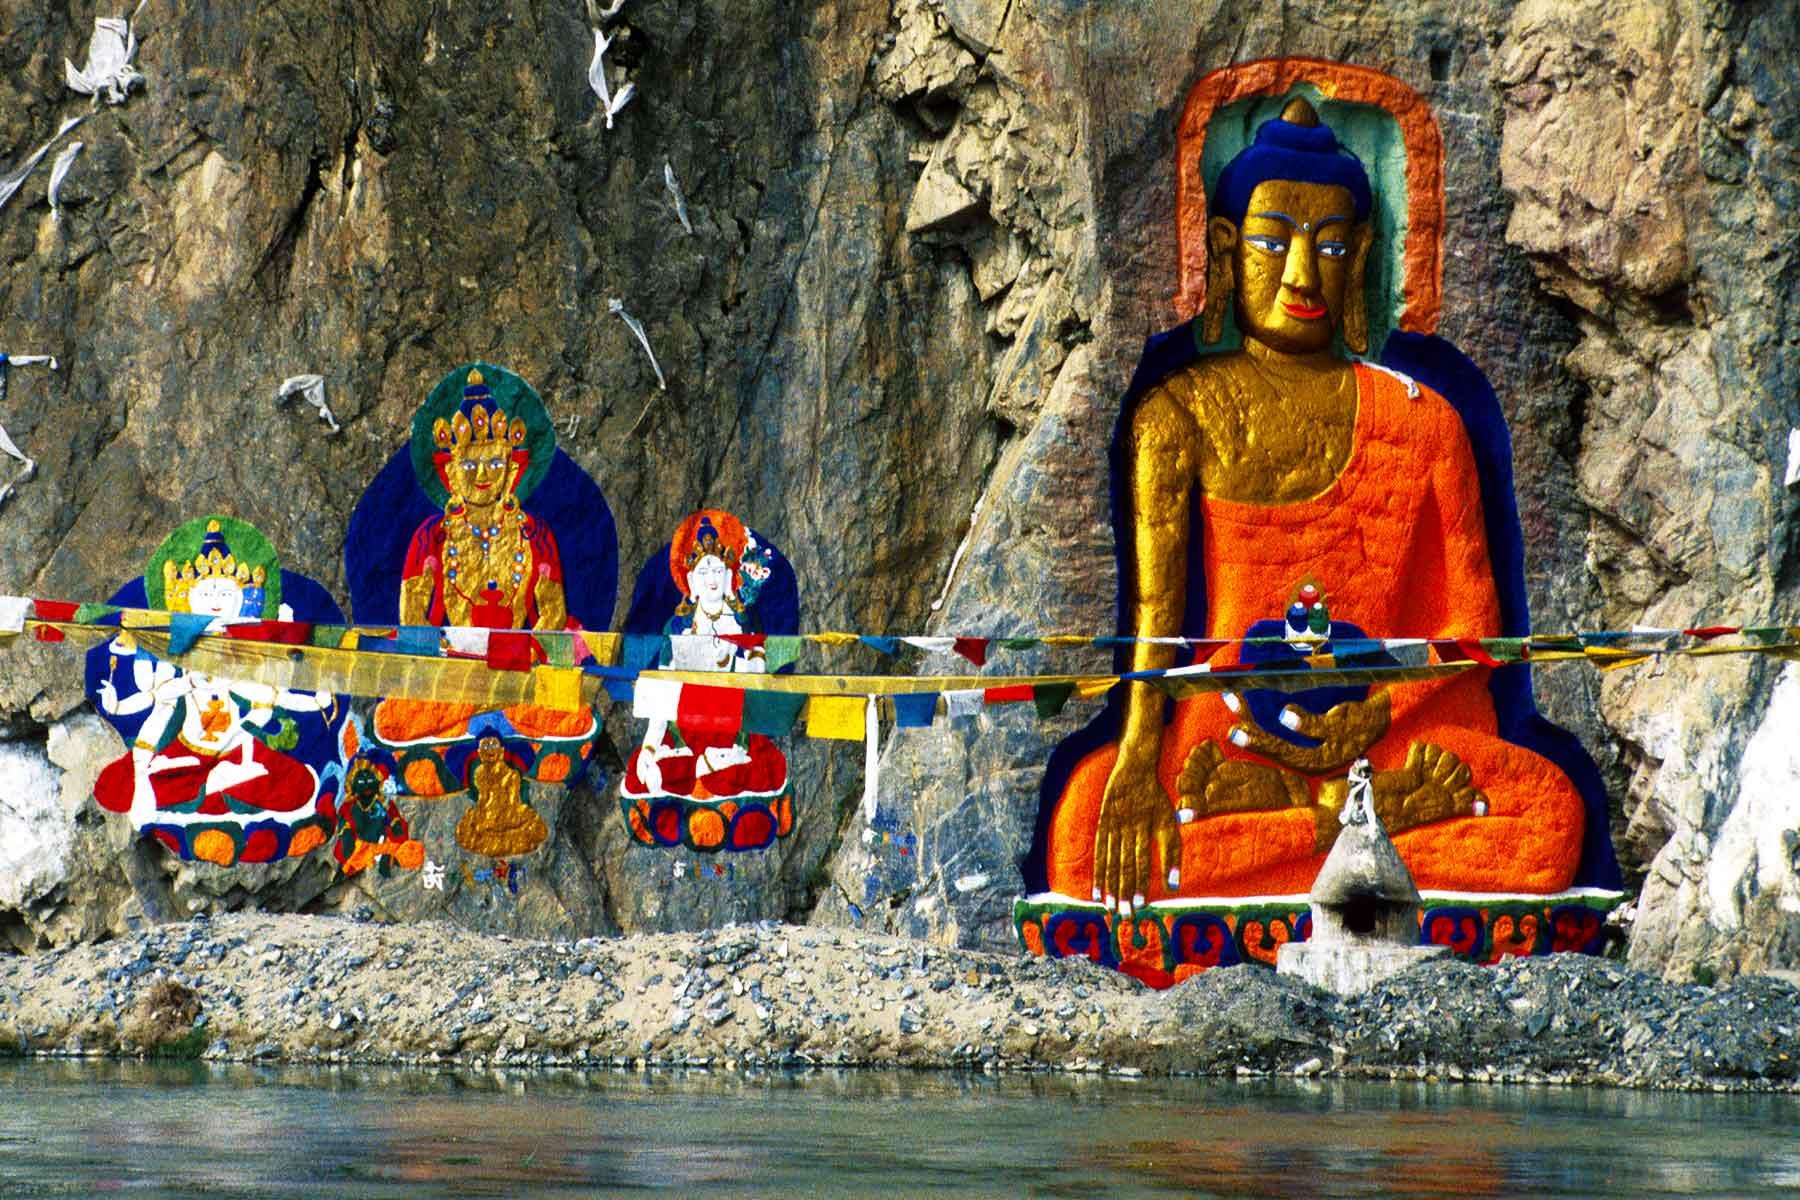 Ancient Buddhist rock art - Lhasa Tibet - Steven Andrew Martin - Study Abroad Journal - University of Hawaii